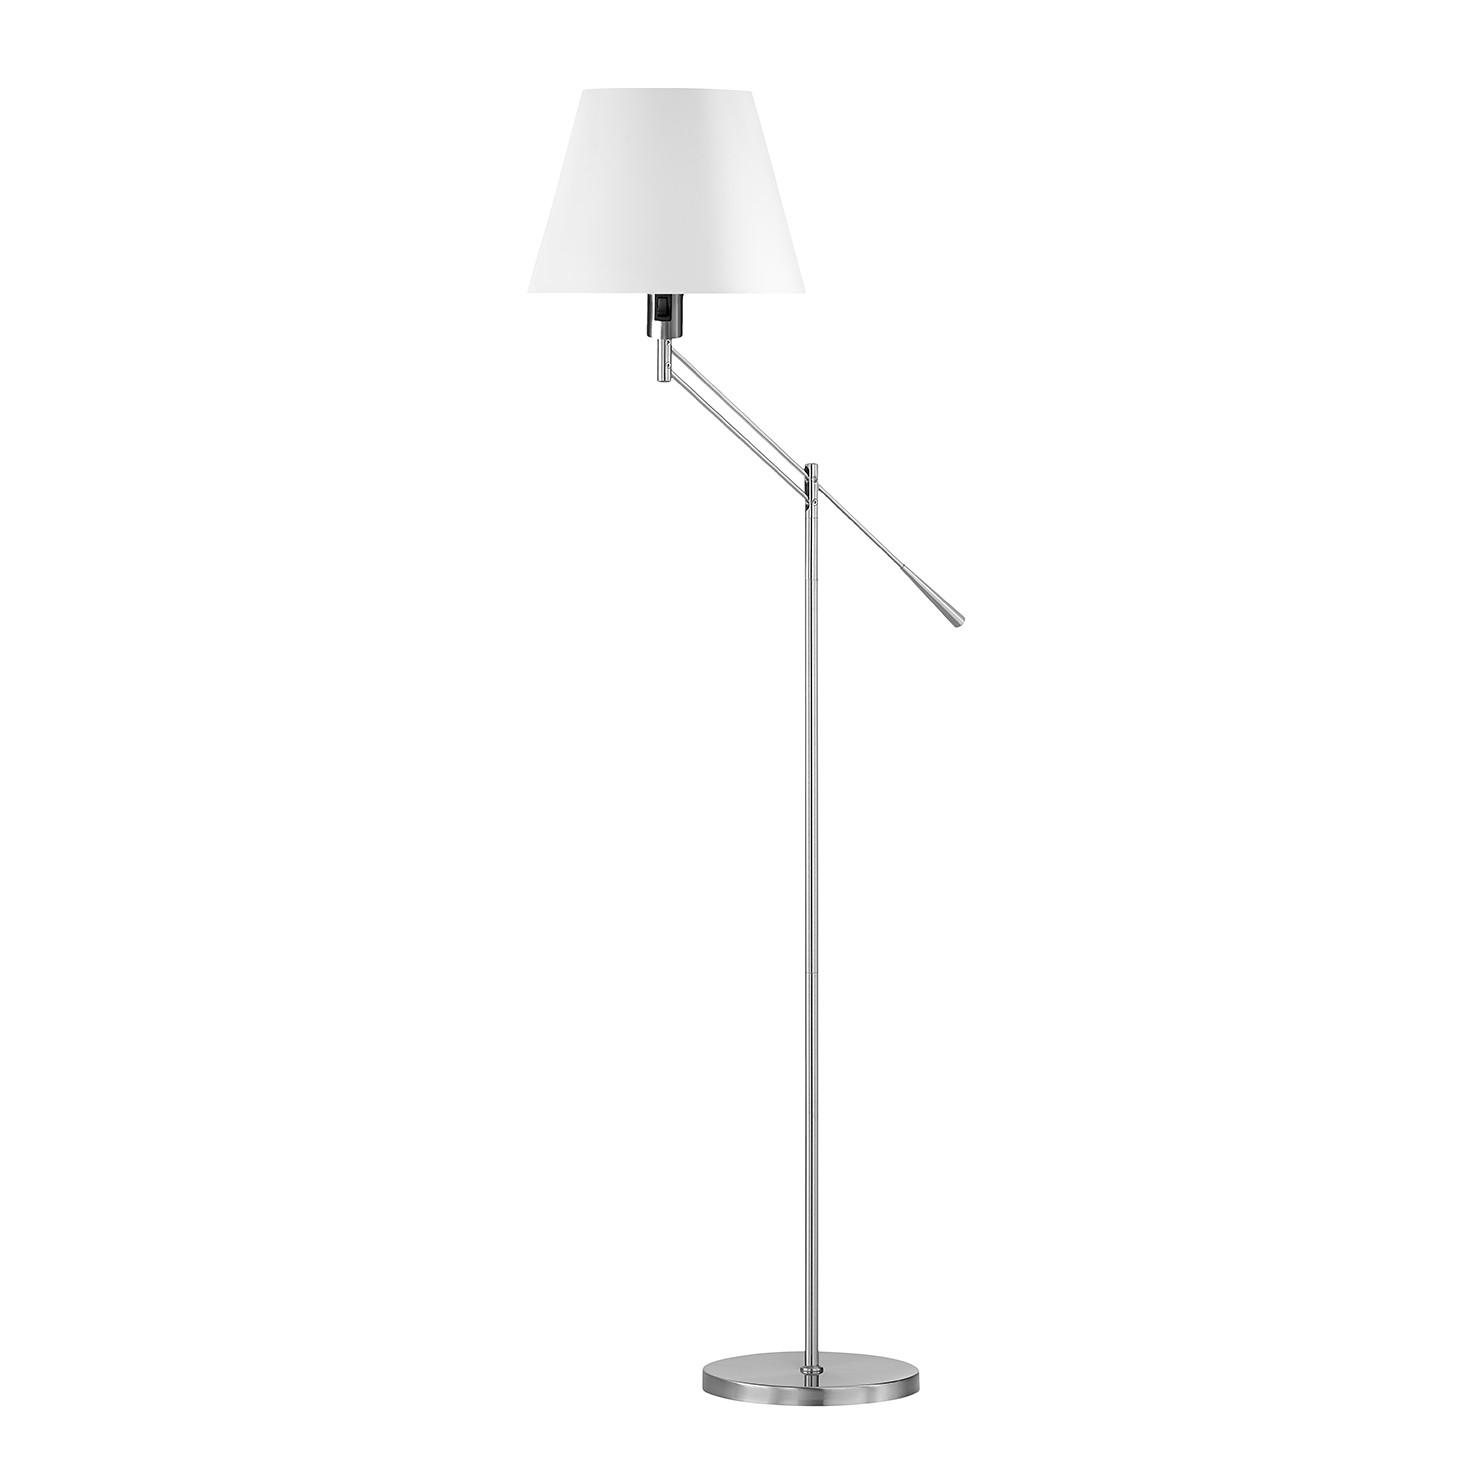 EEK A++, Lampadaire Lever I - Tissu / Fer - 1 ampoule, Honsel Leuchten